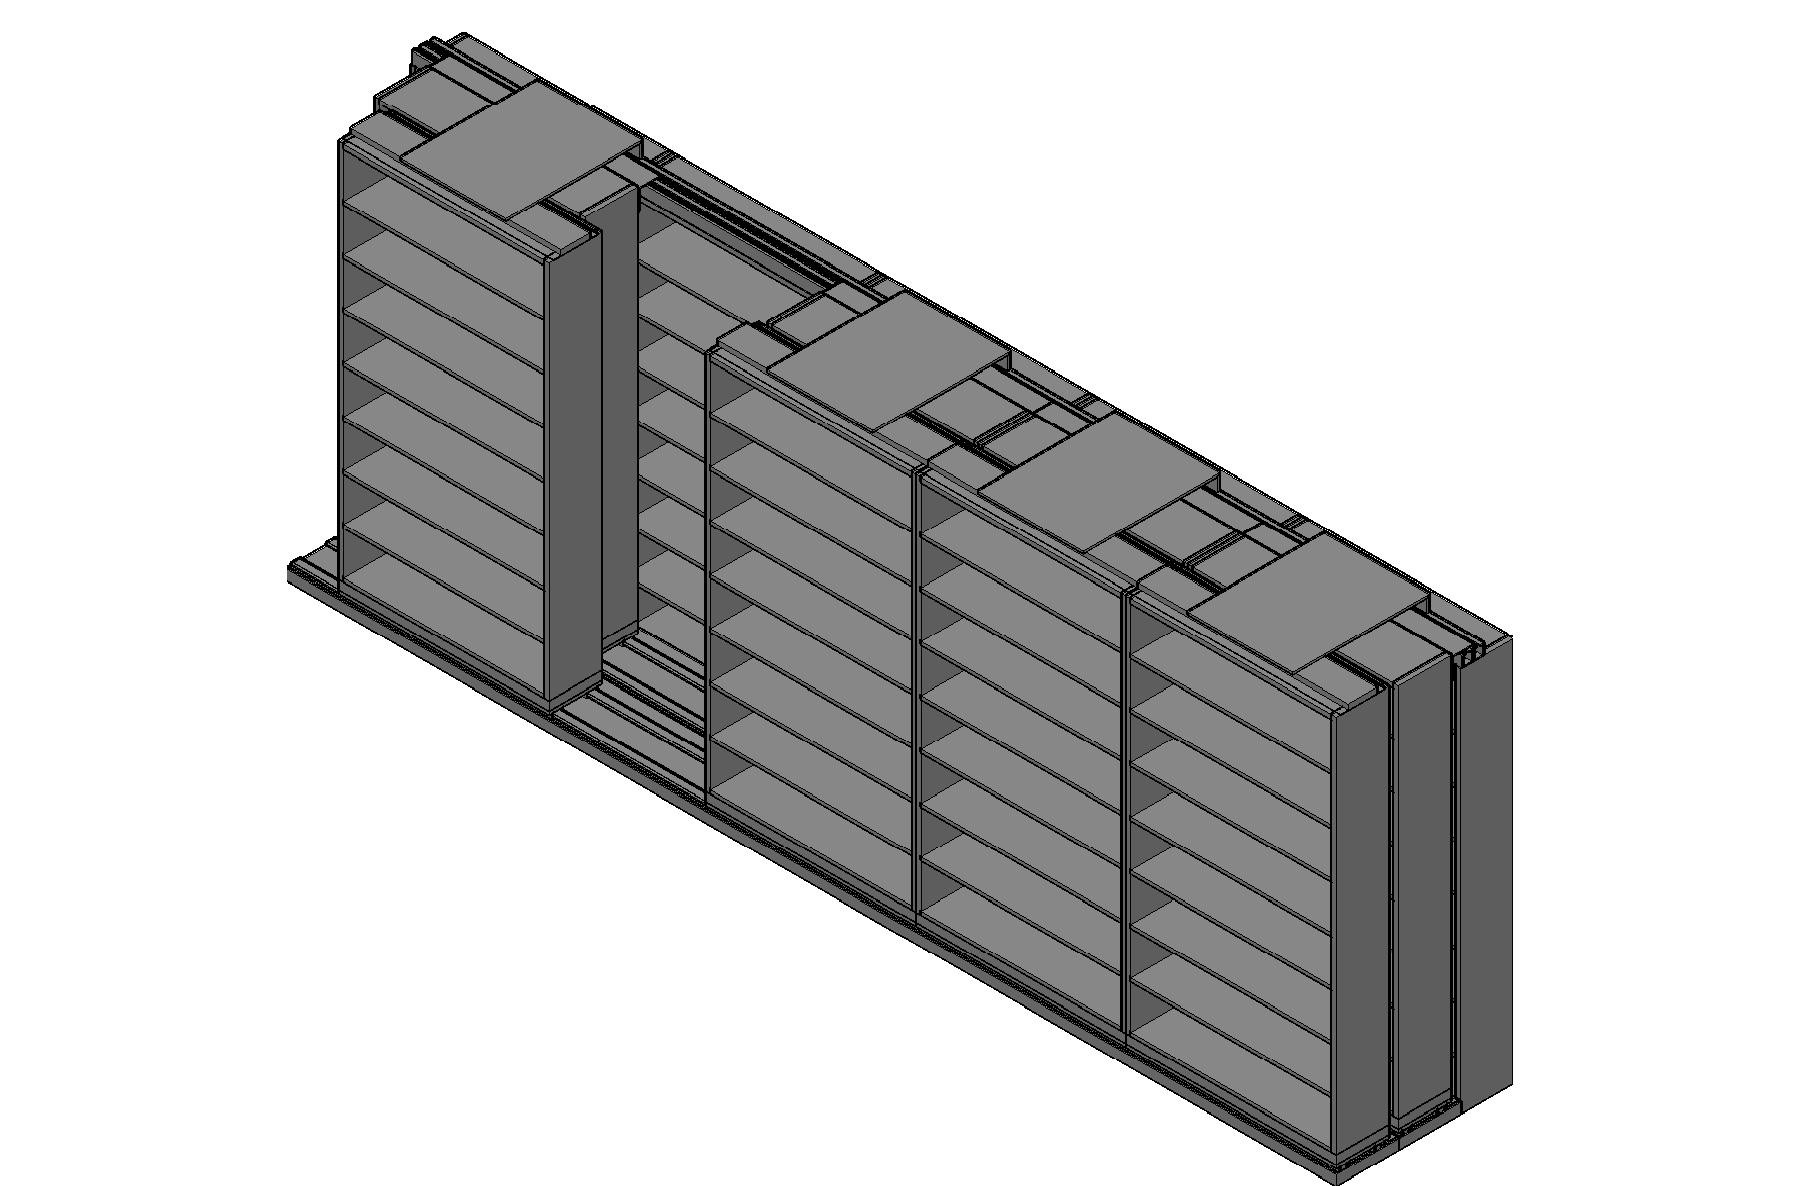 "Letter Size Sliding Shelves - 3 Rows Deep - 8 Levels - (48"" x 12"" Shelves) - 244"" Total Width"